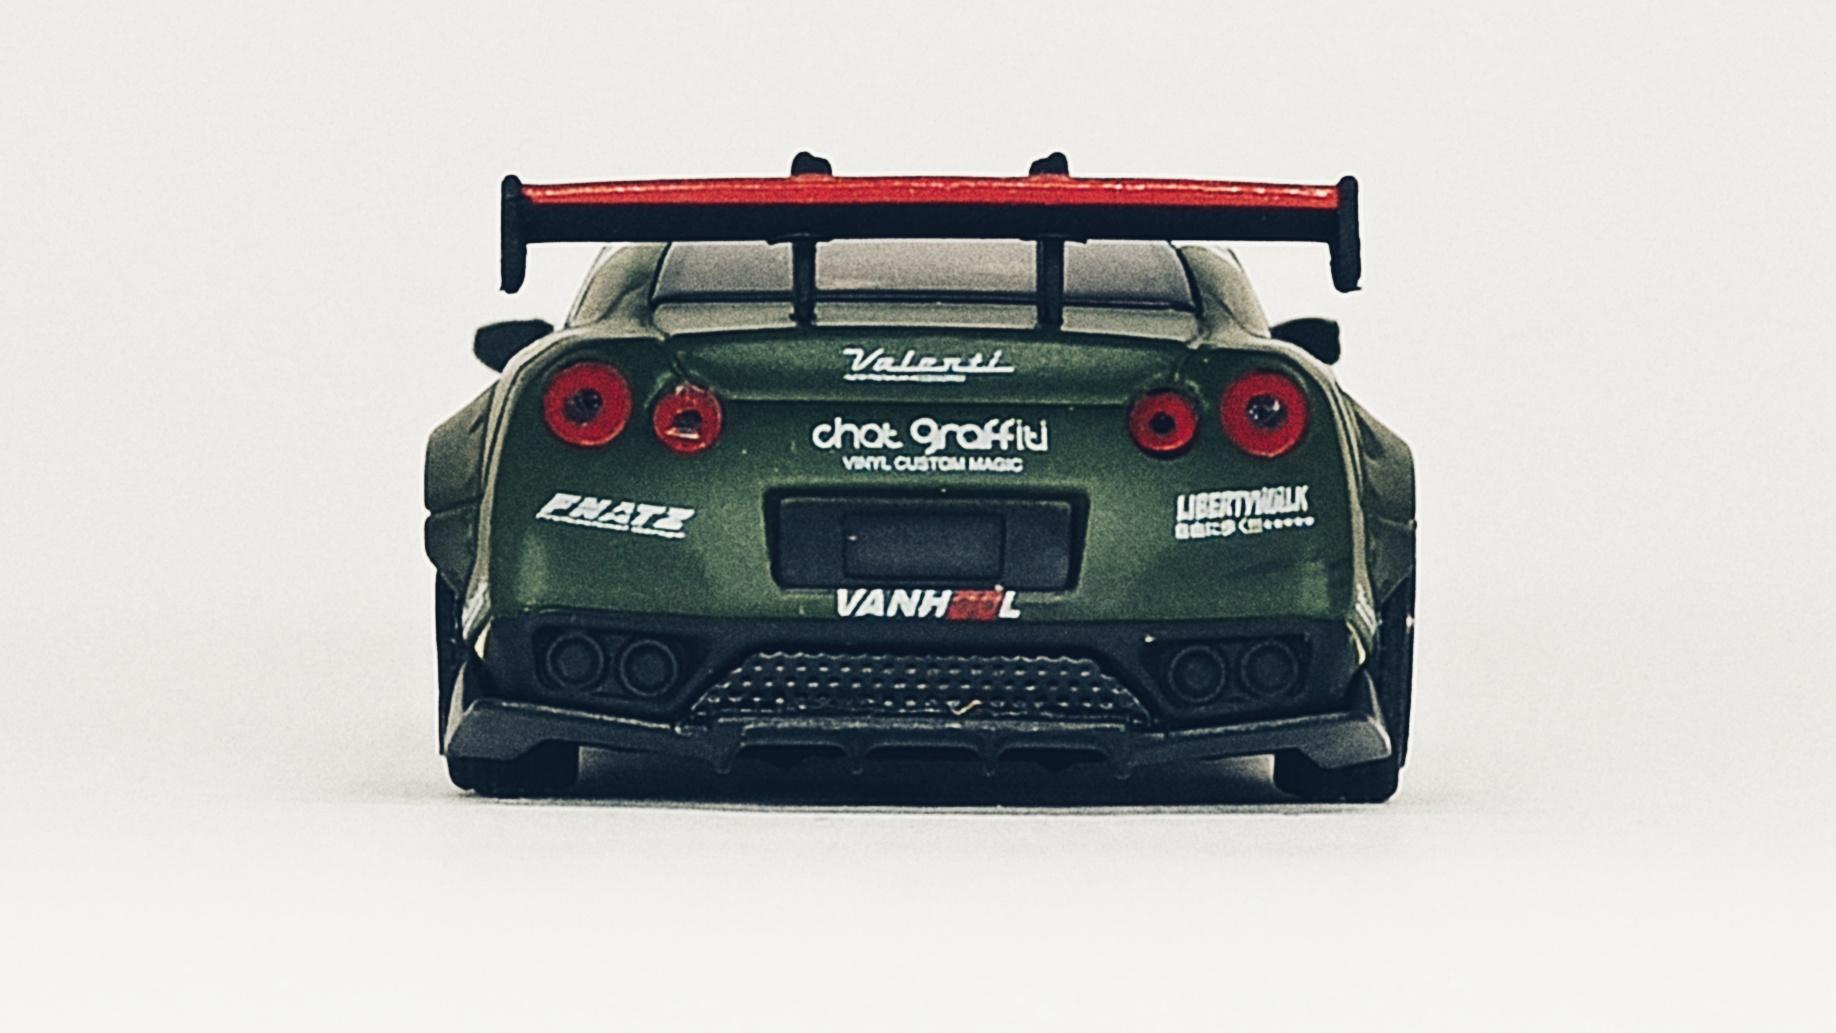 Mini GT Nissan GT-R (R35) (MGT00007-R) 2018 Liberty Walk LB★Works Type 1 Rear Wing ver 1 Zero Fighter Special (RHD) back